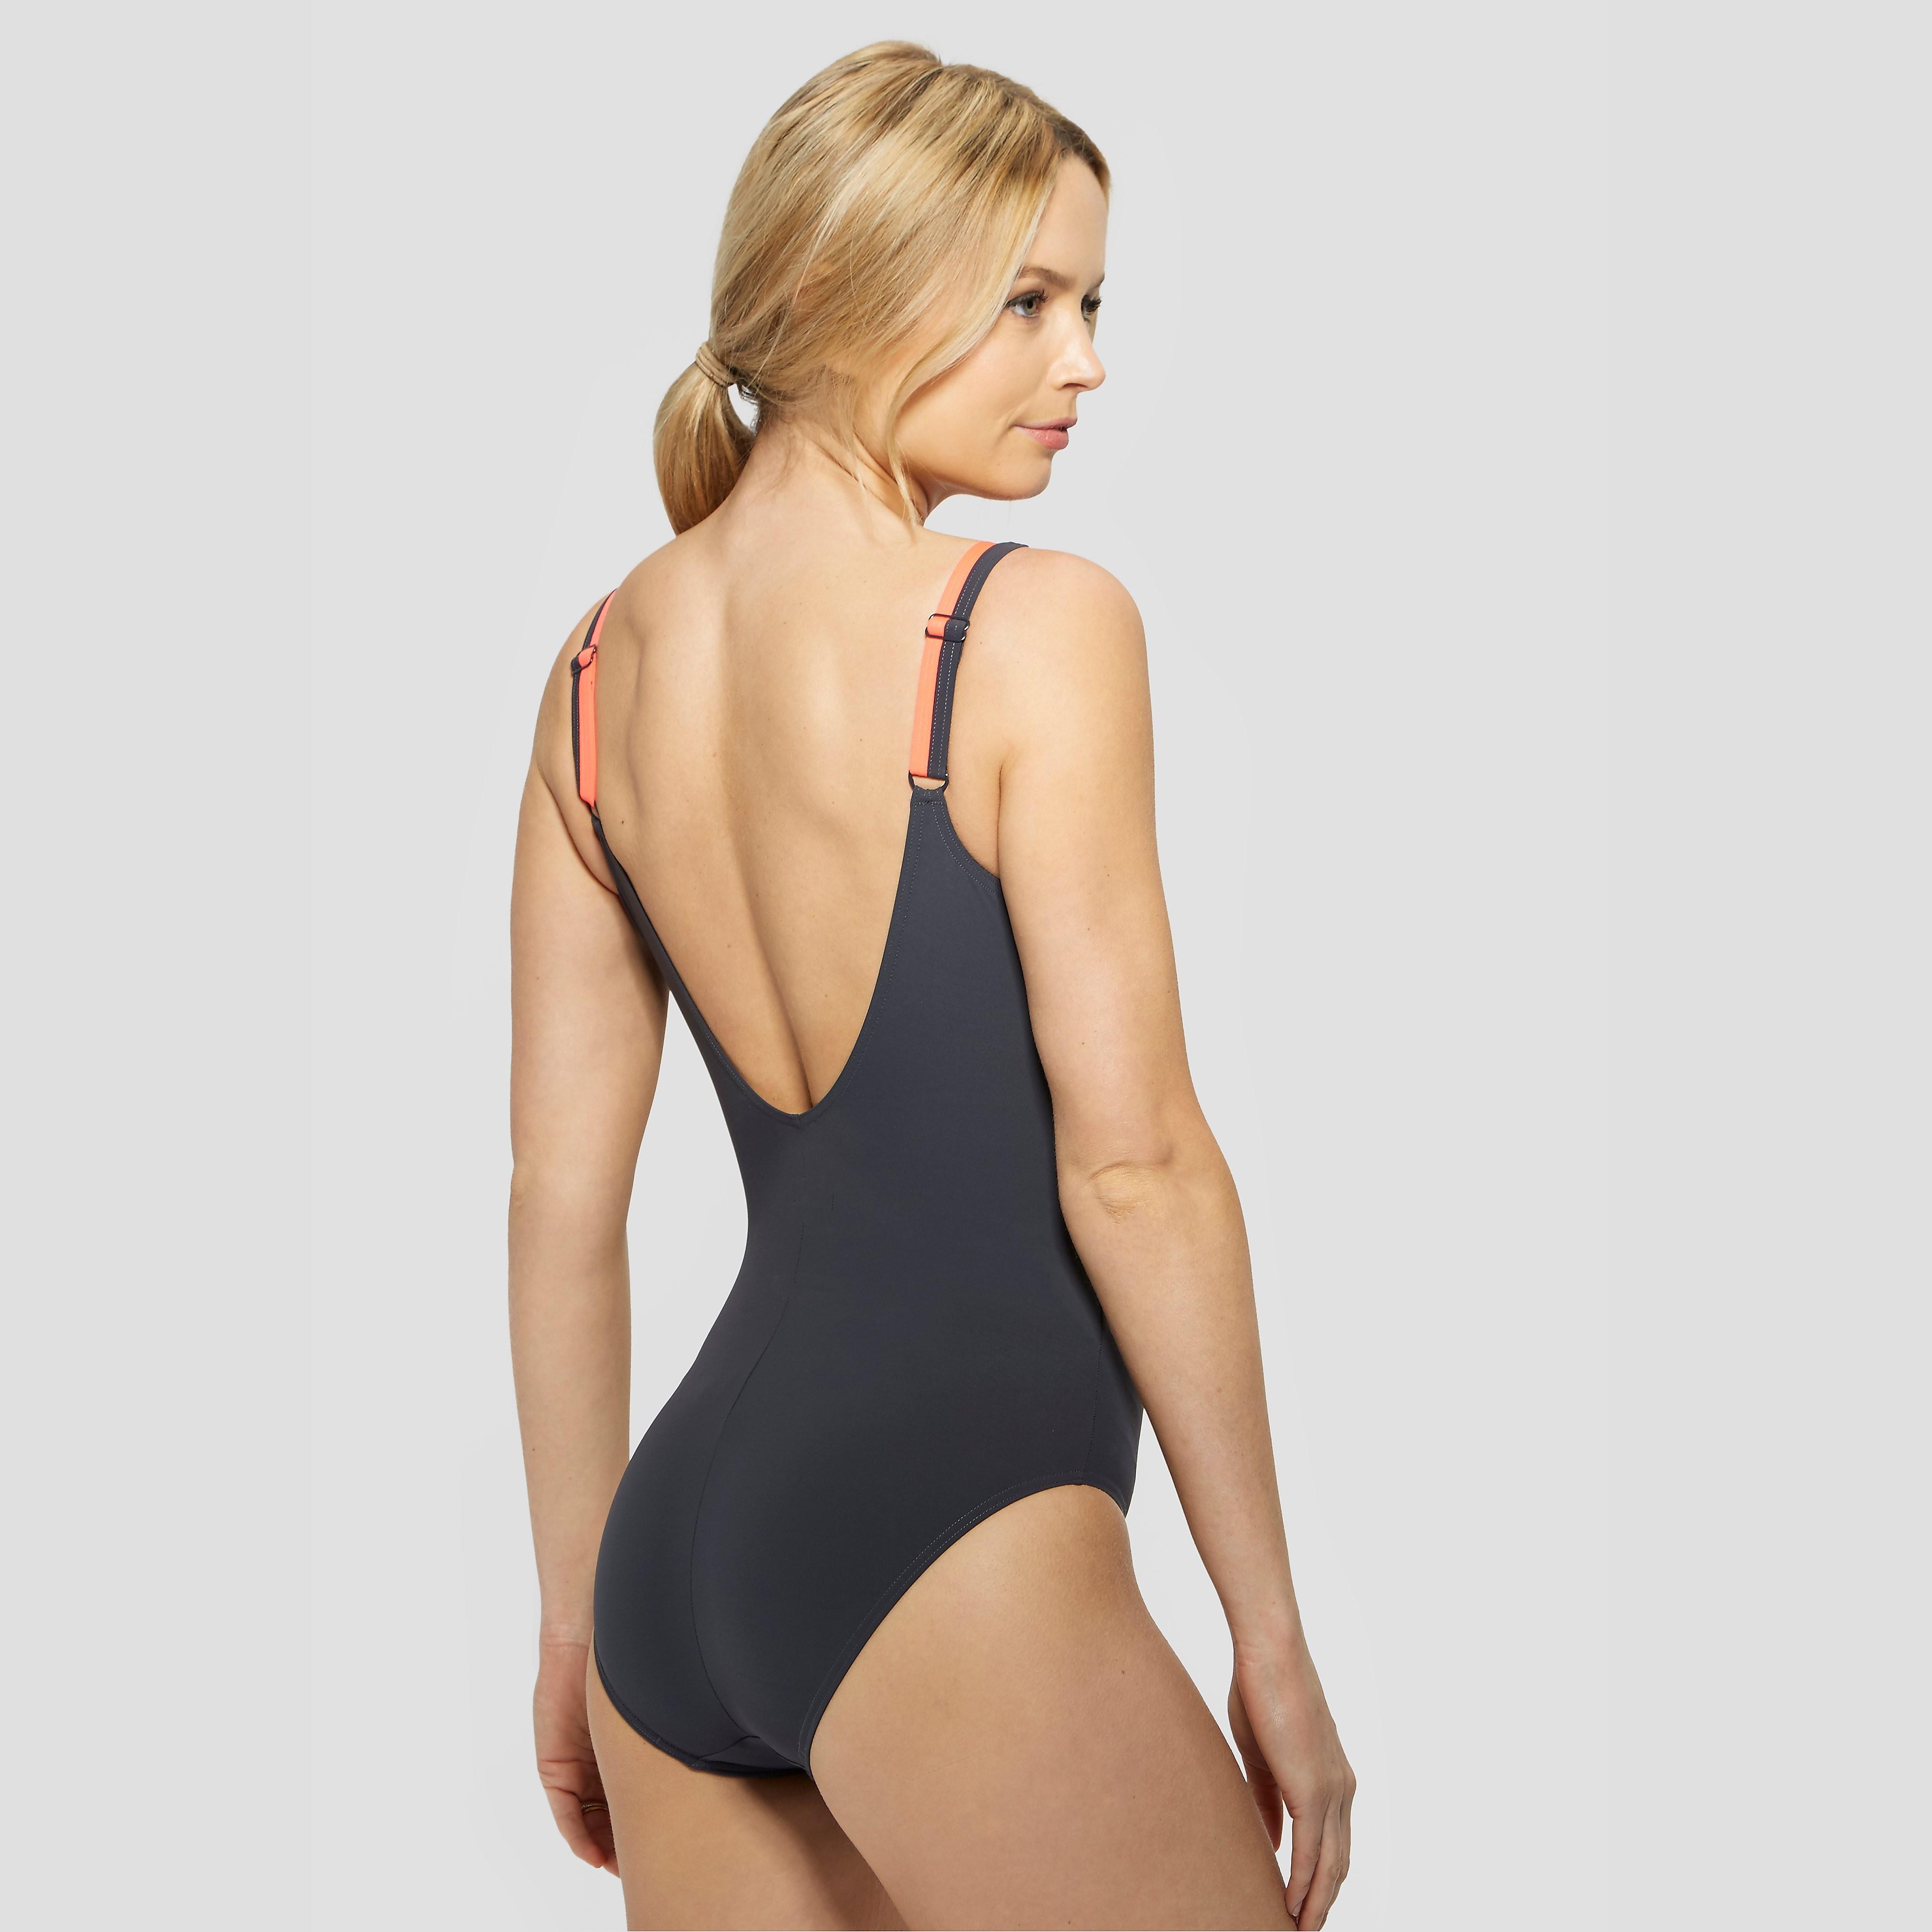 Speedo Sculpture Contour Women's Swimsuit